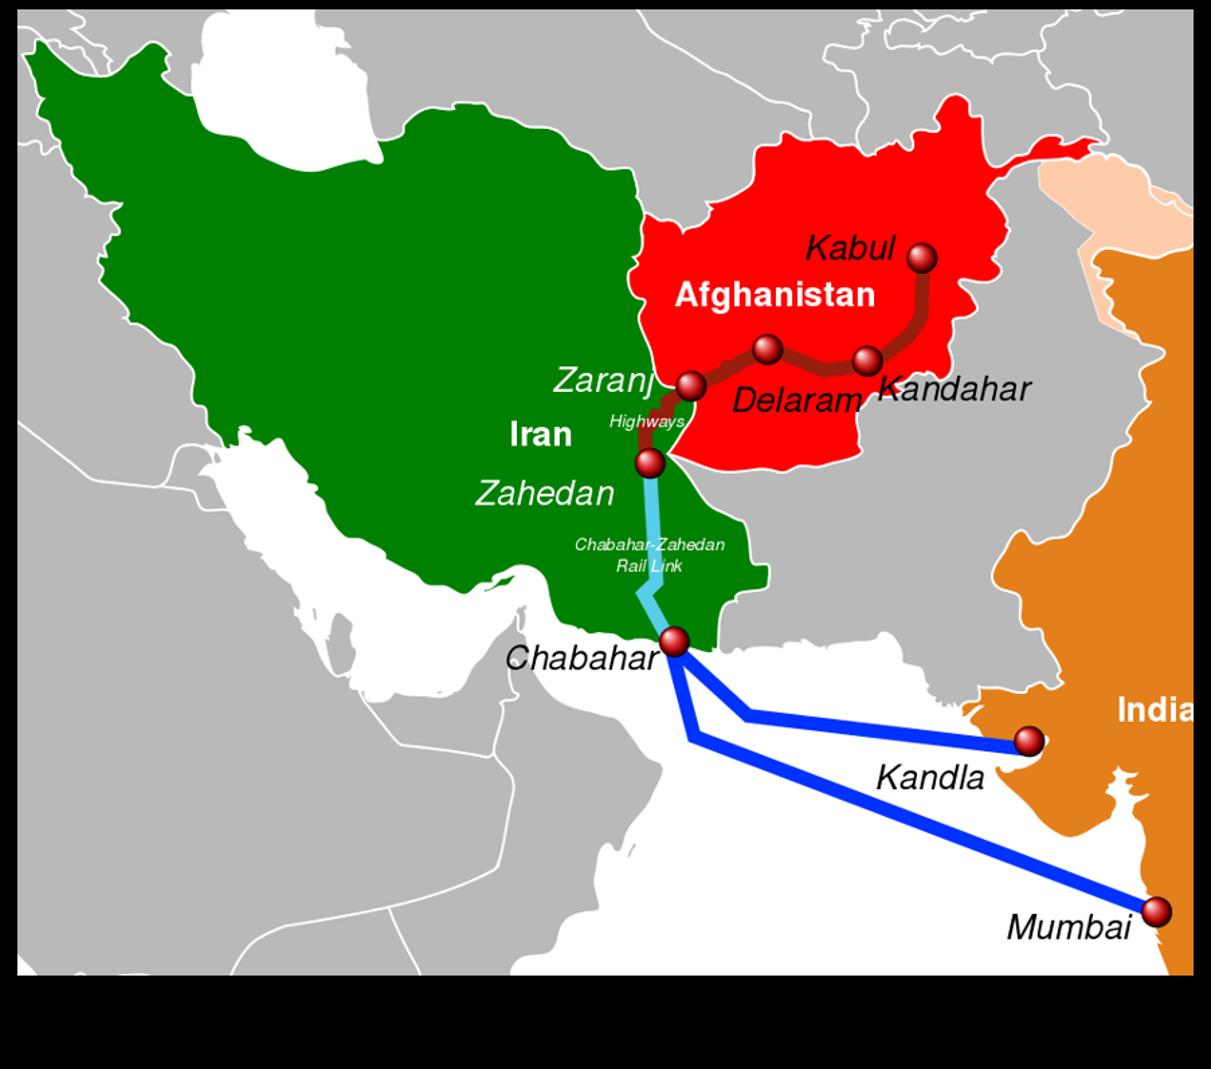 Chabahar map